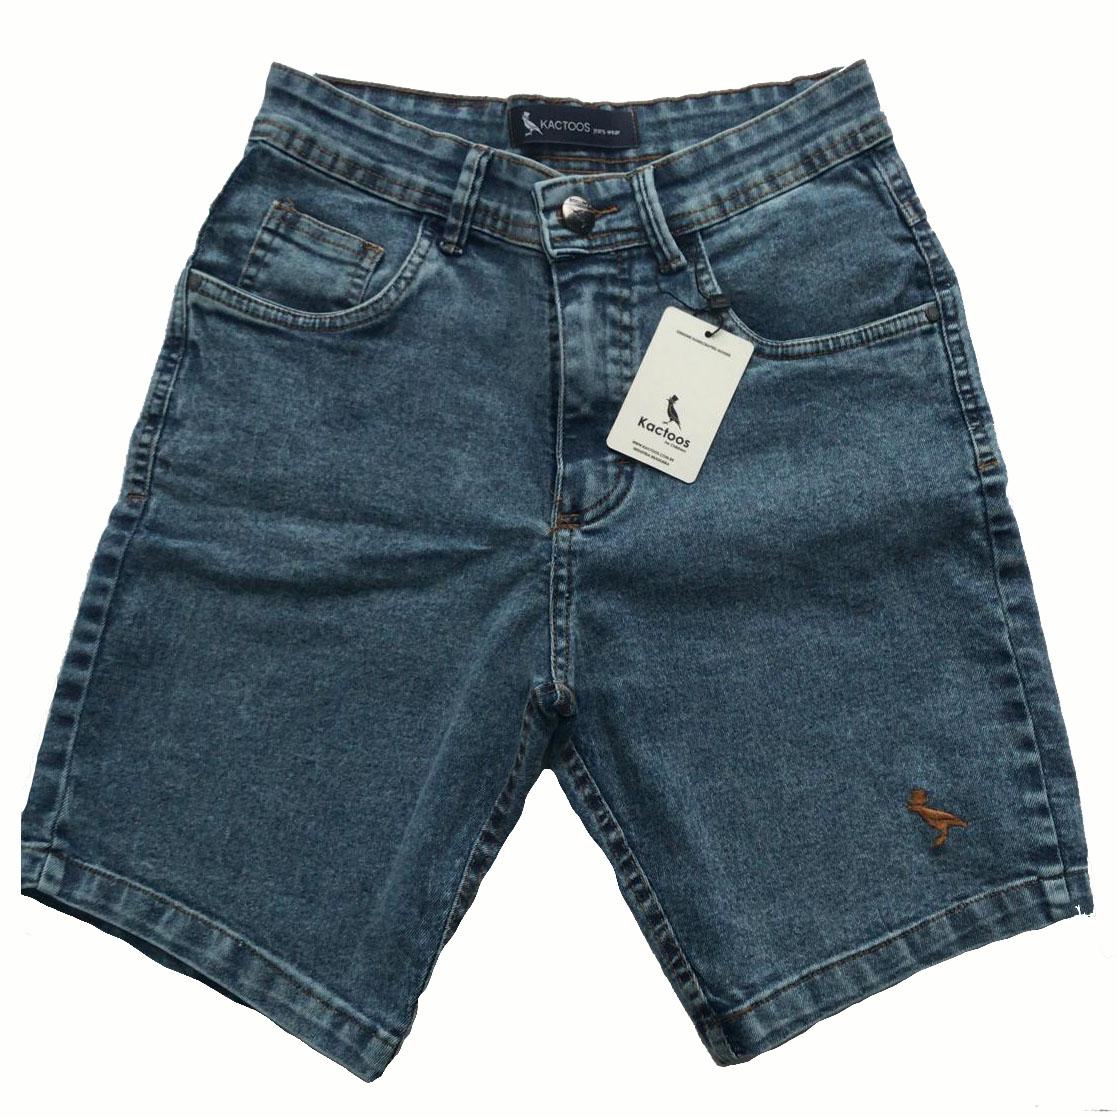 Bermuda Jeans Masculino  - Kactoos